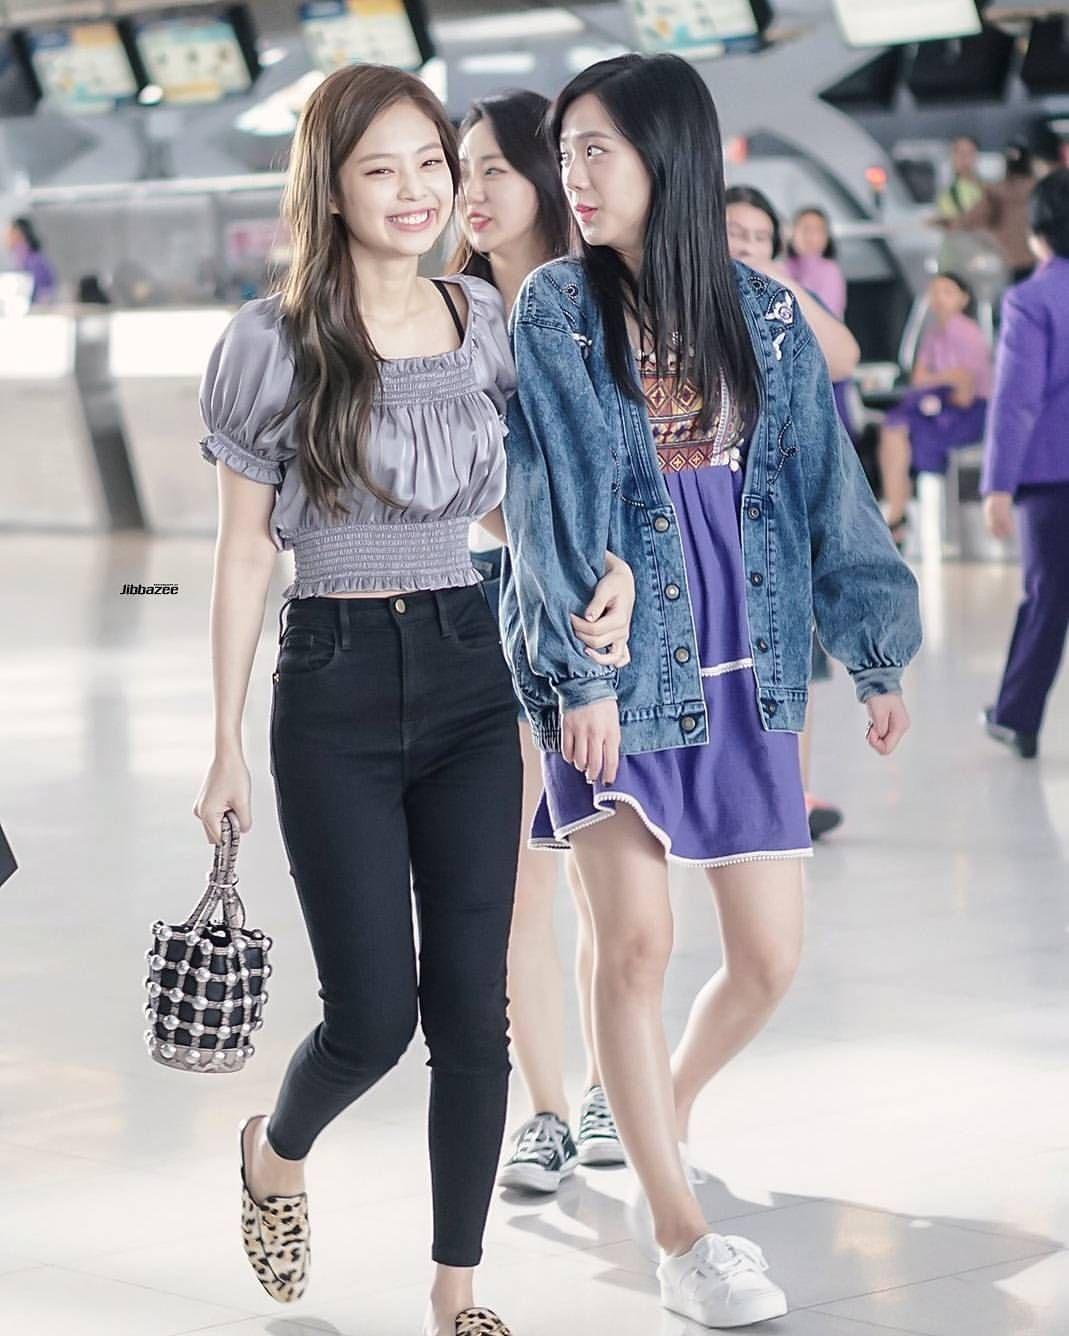 Blackpink Jisoo Jennie jensoo airport style | KPOP | Pinterest | Blackpink Airport style and Kpop